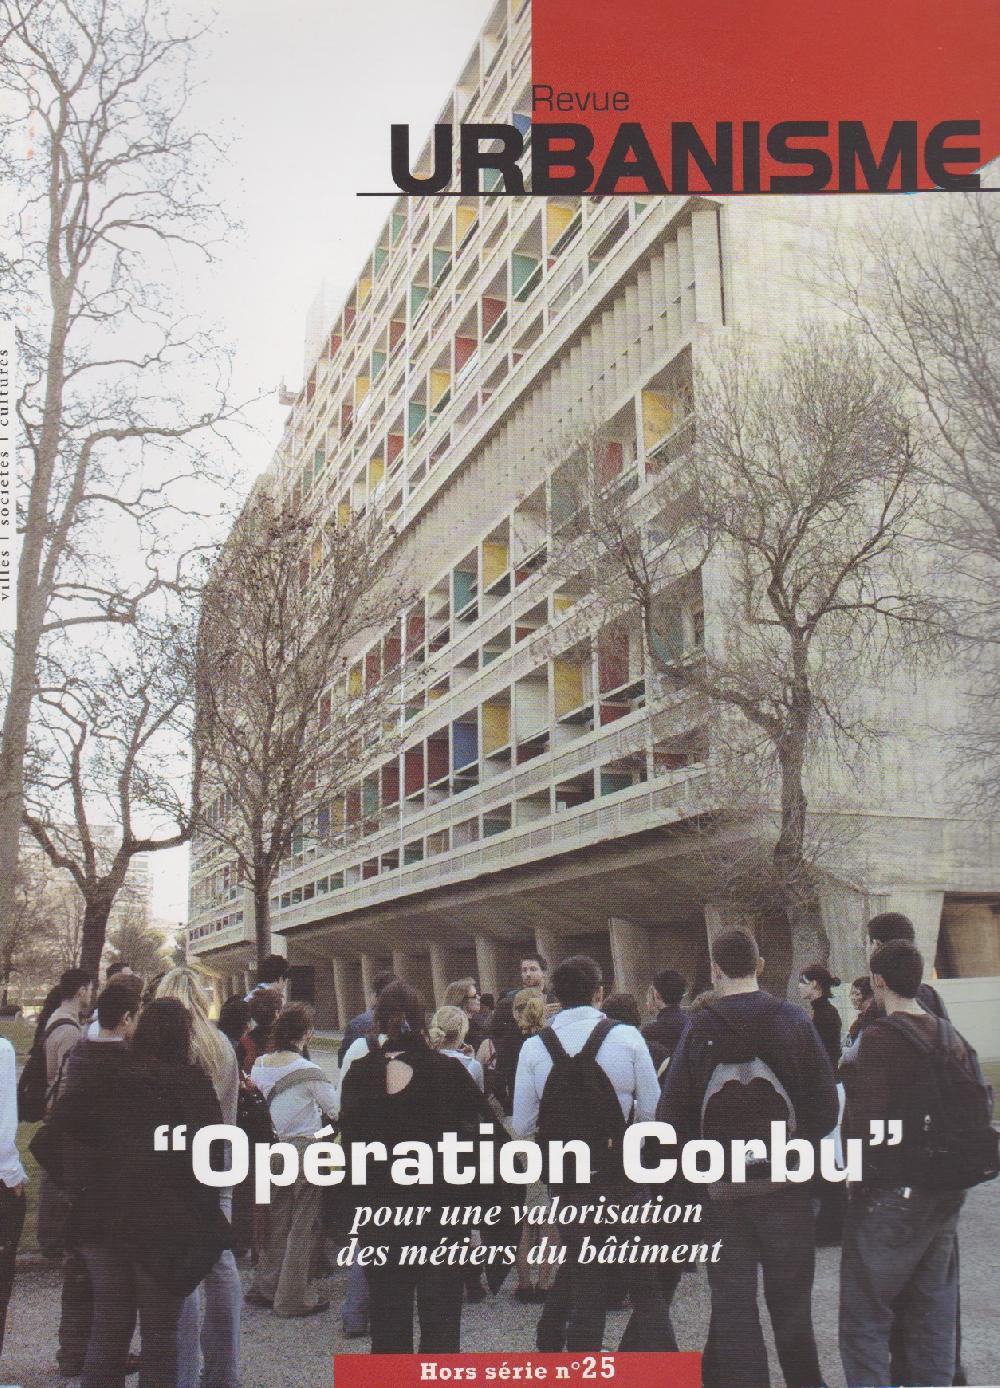 Urbanisme HS n°25